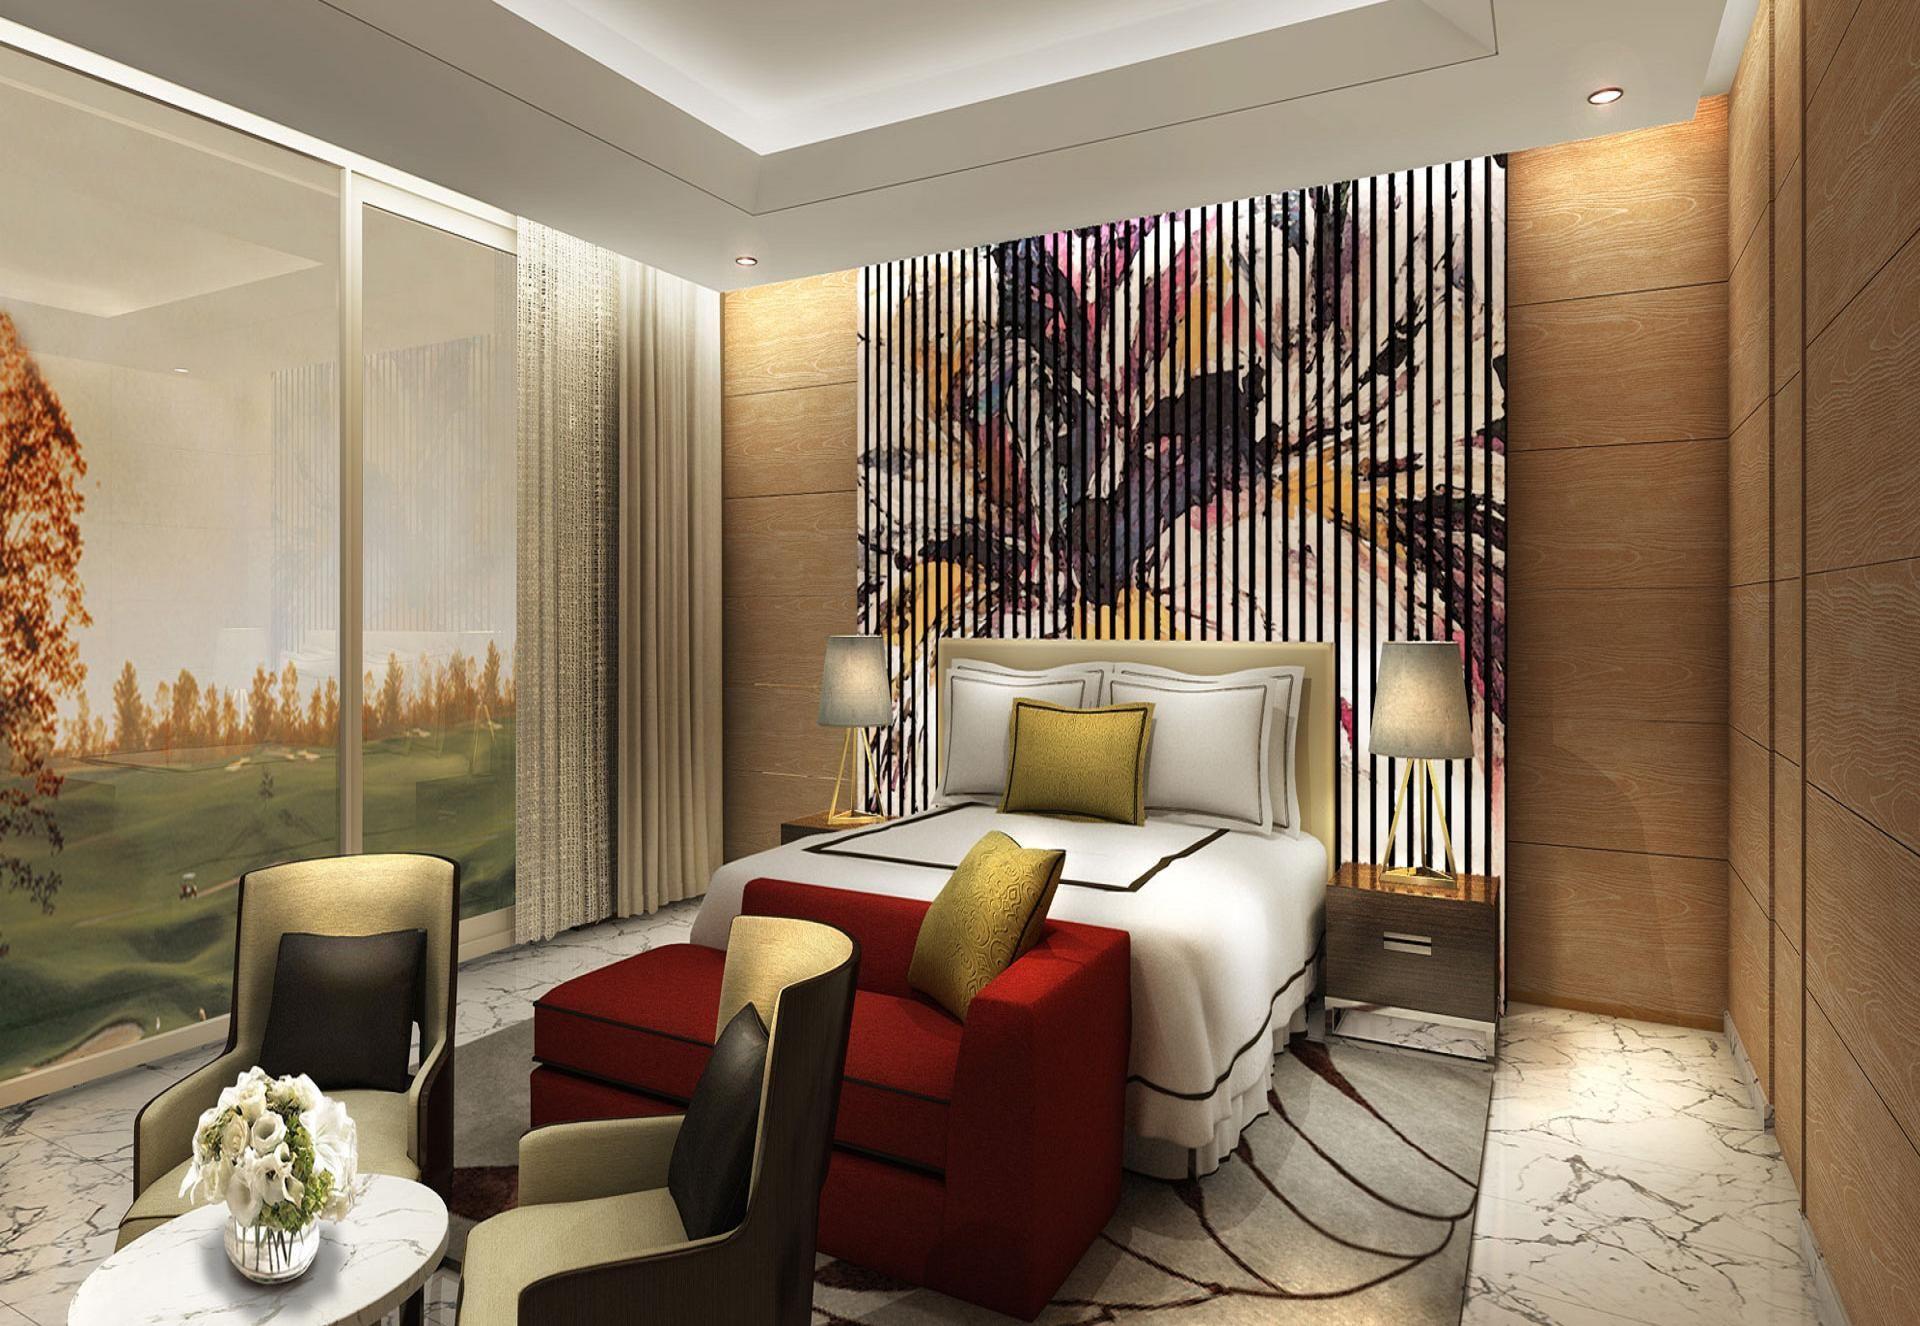 resaiki is amongst the top interior designers in delhi gurgaon